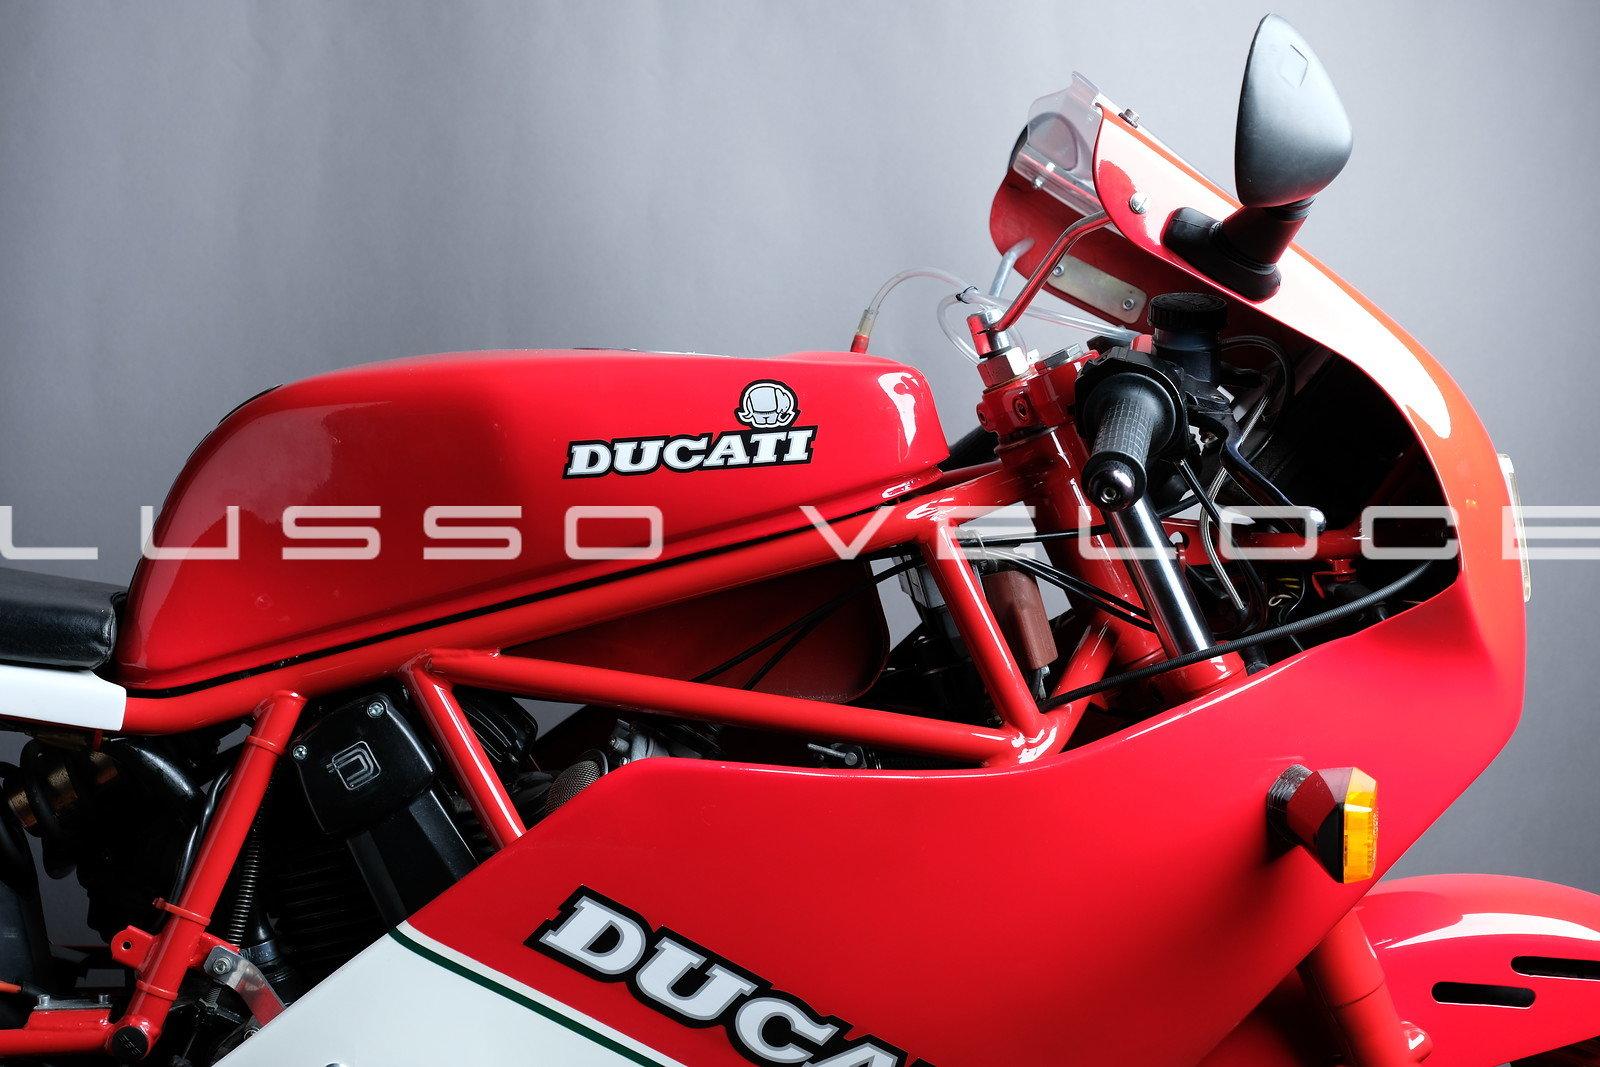 1986 Rare Ducati F3 350 fully restored For Sale (picture 2 of 15)